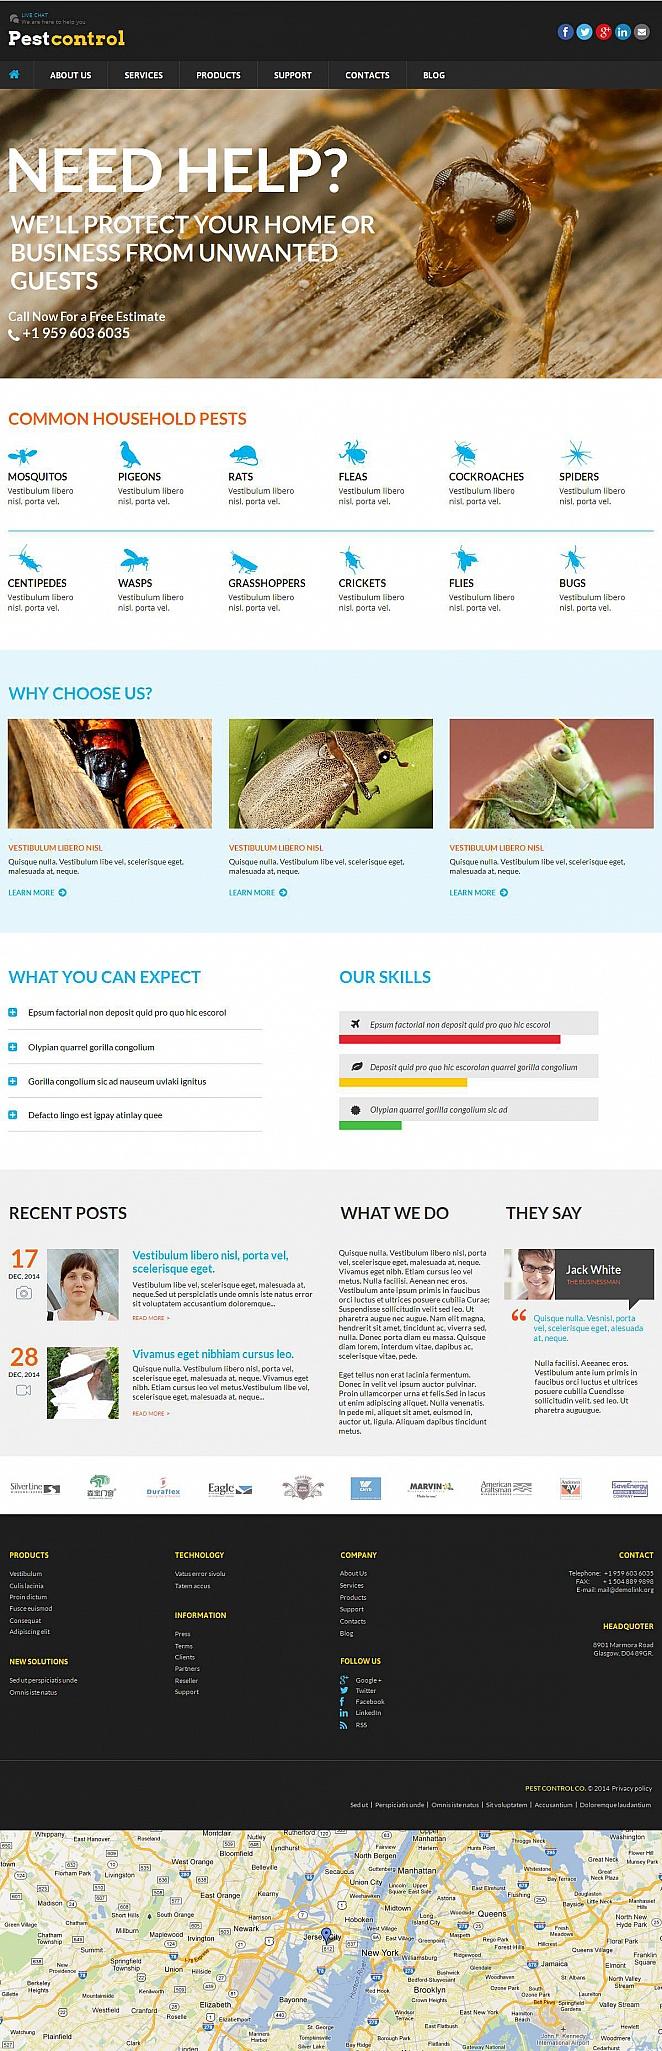 Home Pest Control Website Template - image